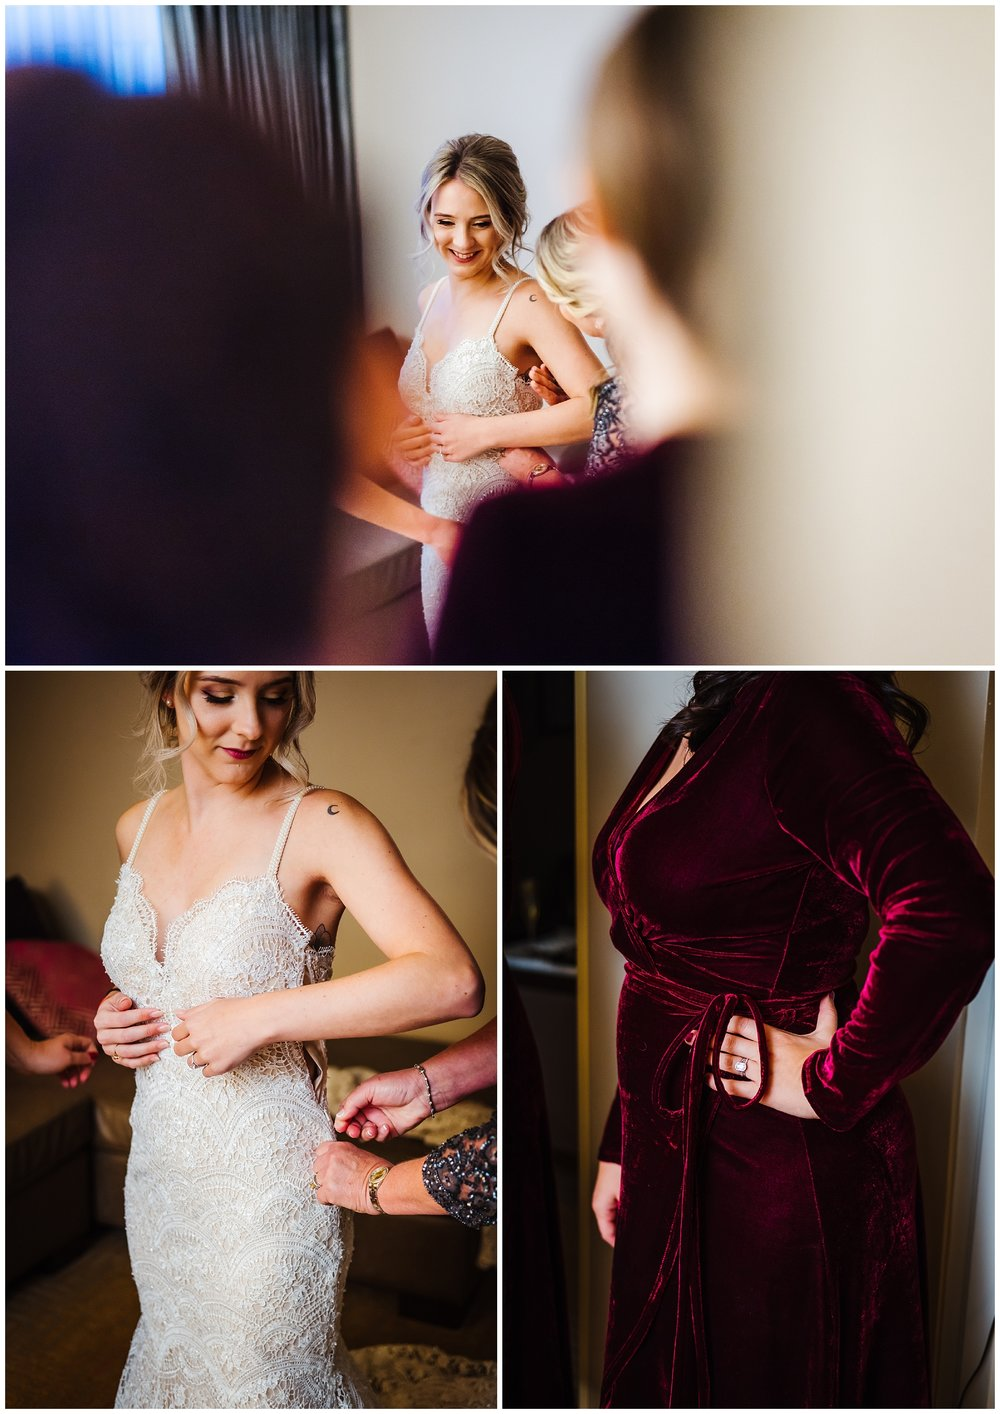 tampa-armeture-wedding-photographer-edgy-industrial-downtown-fancy-free-nursery-tattoo-burgandy-velvet_0009.jpg